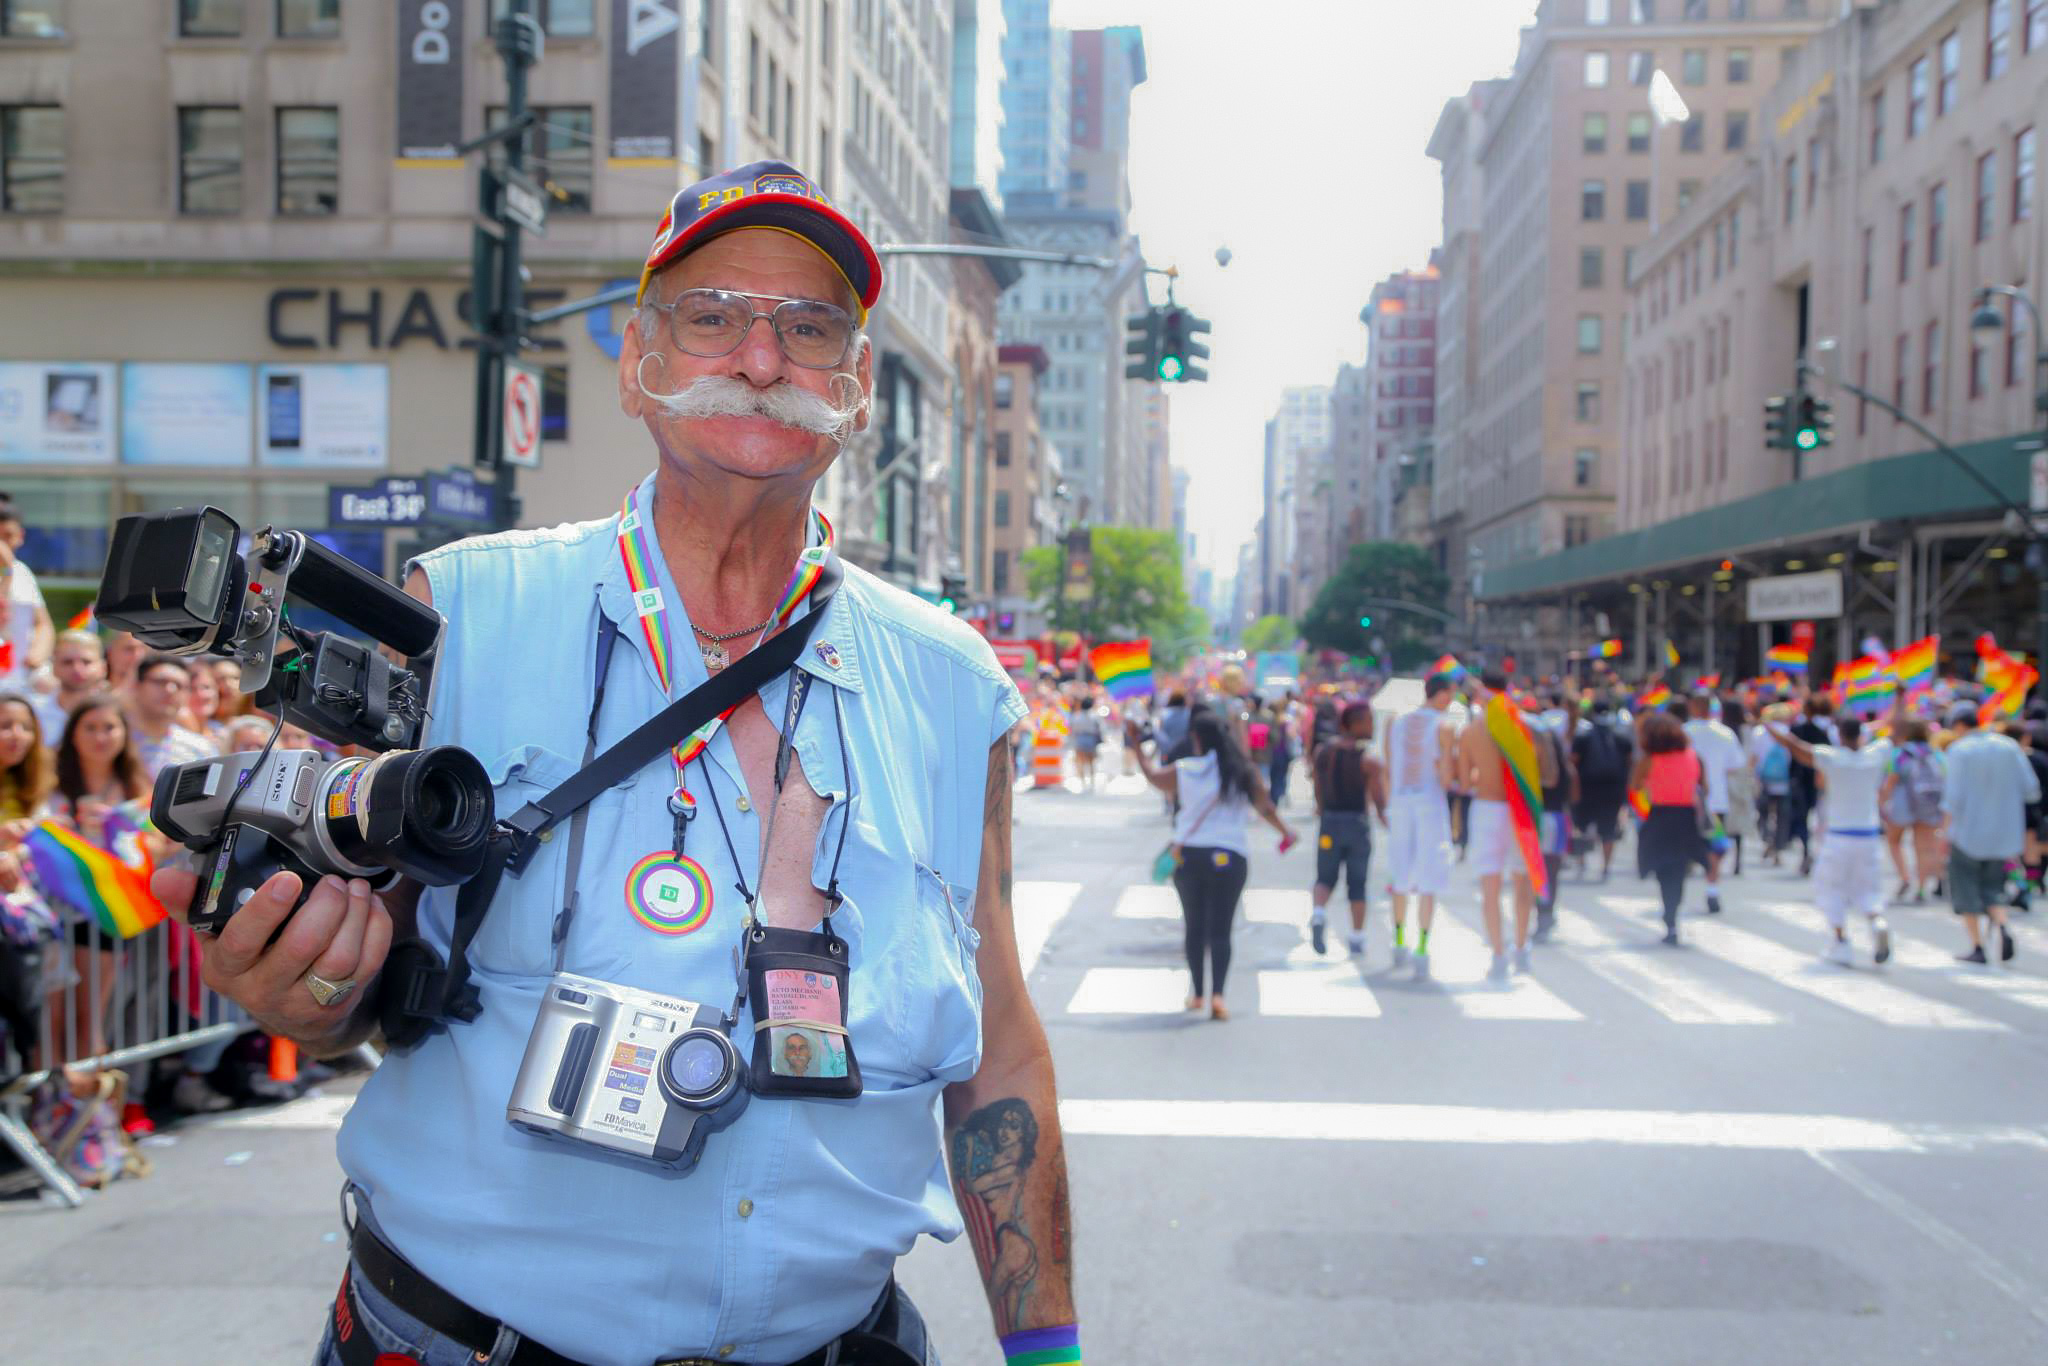 34TH STREET, NYC, 2016